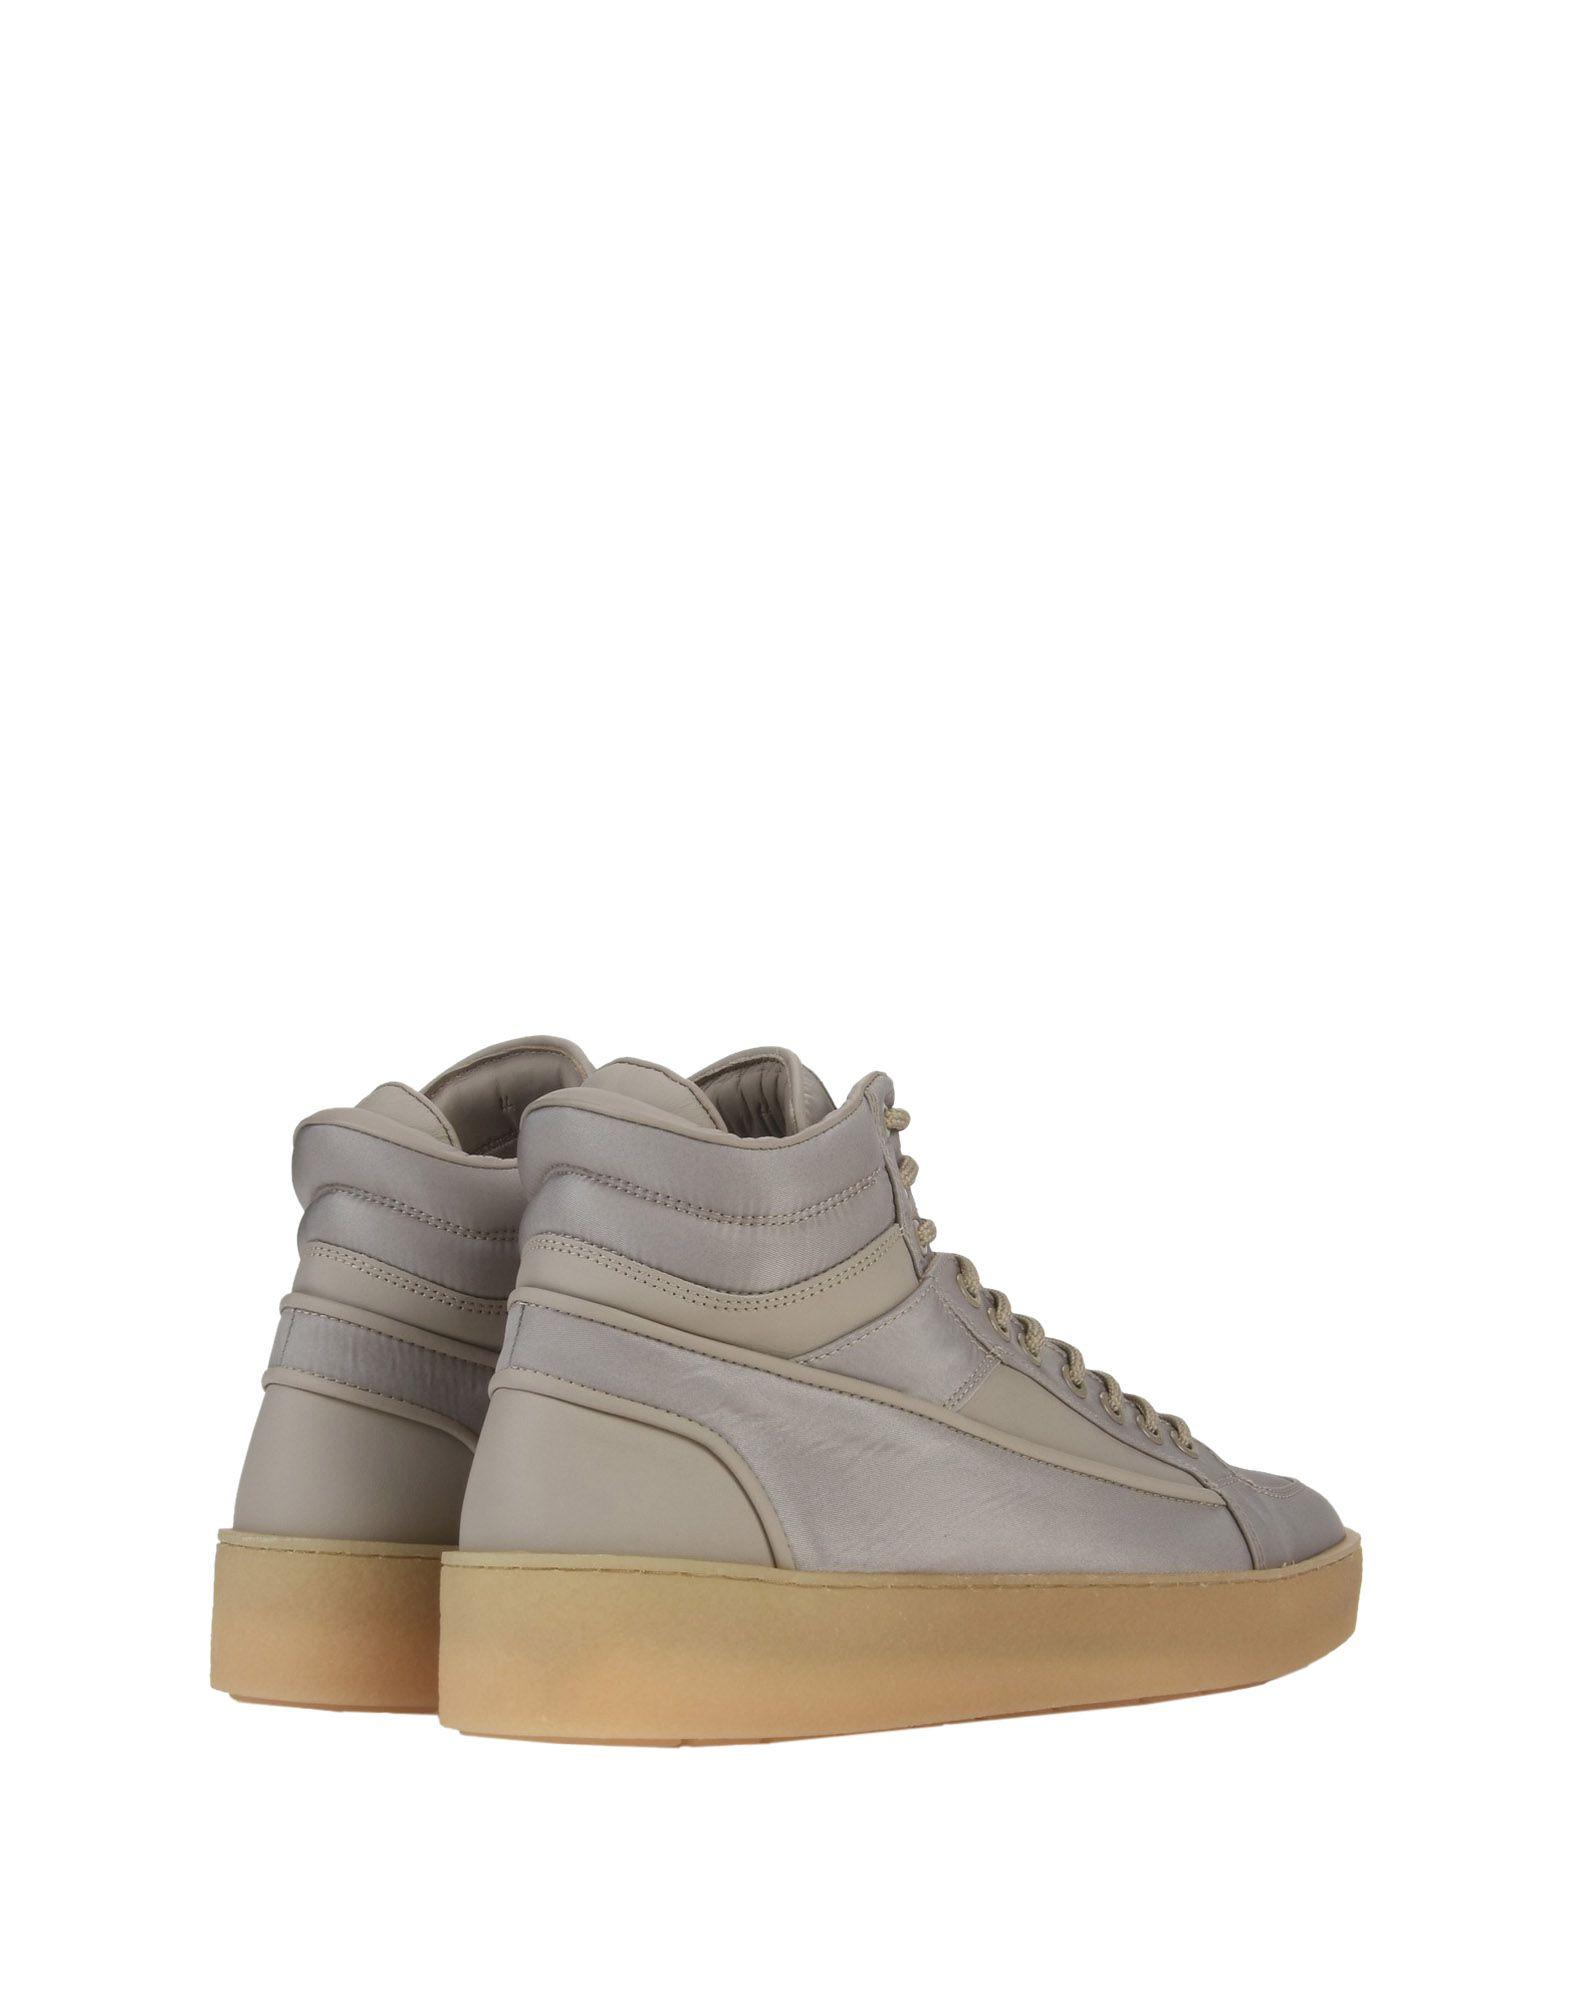 Sneakers Etq Amsterdam  High 2 - Uomo - 11470728PL